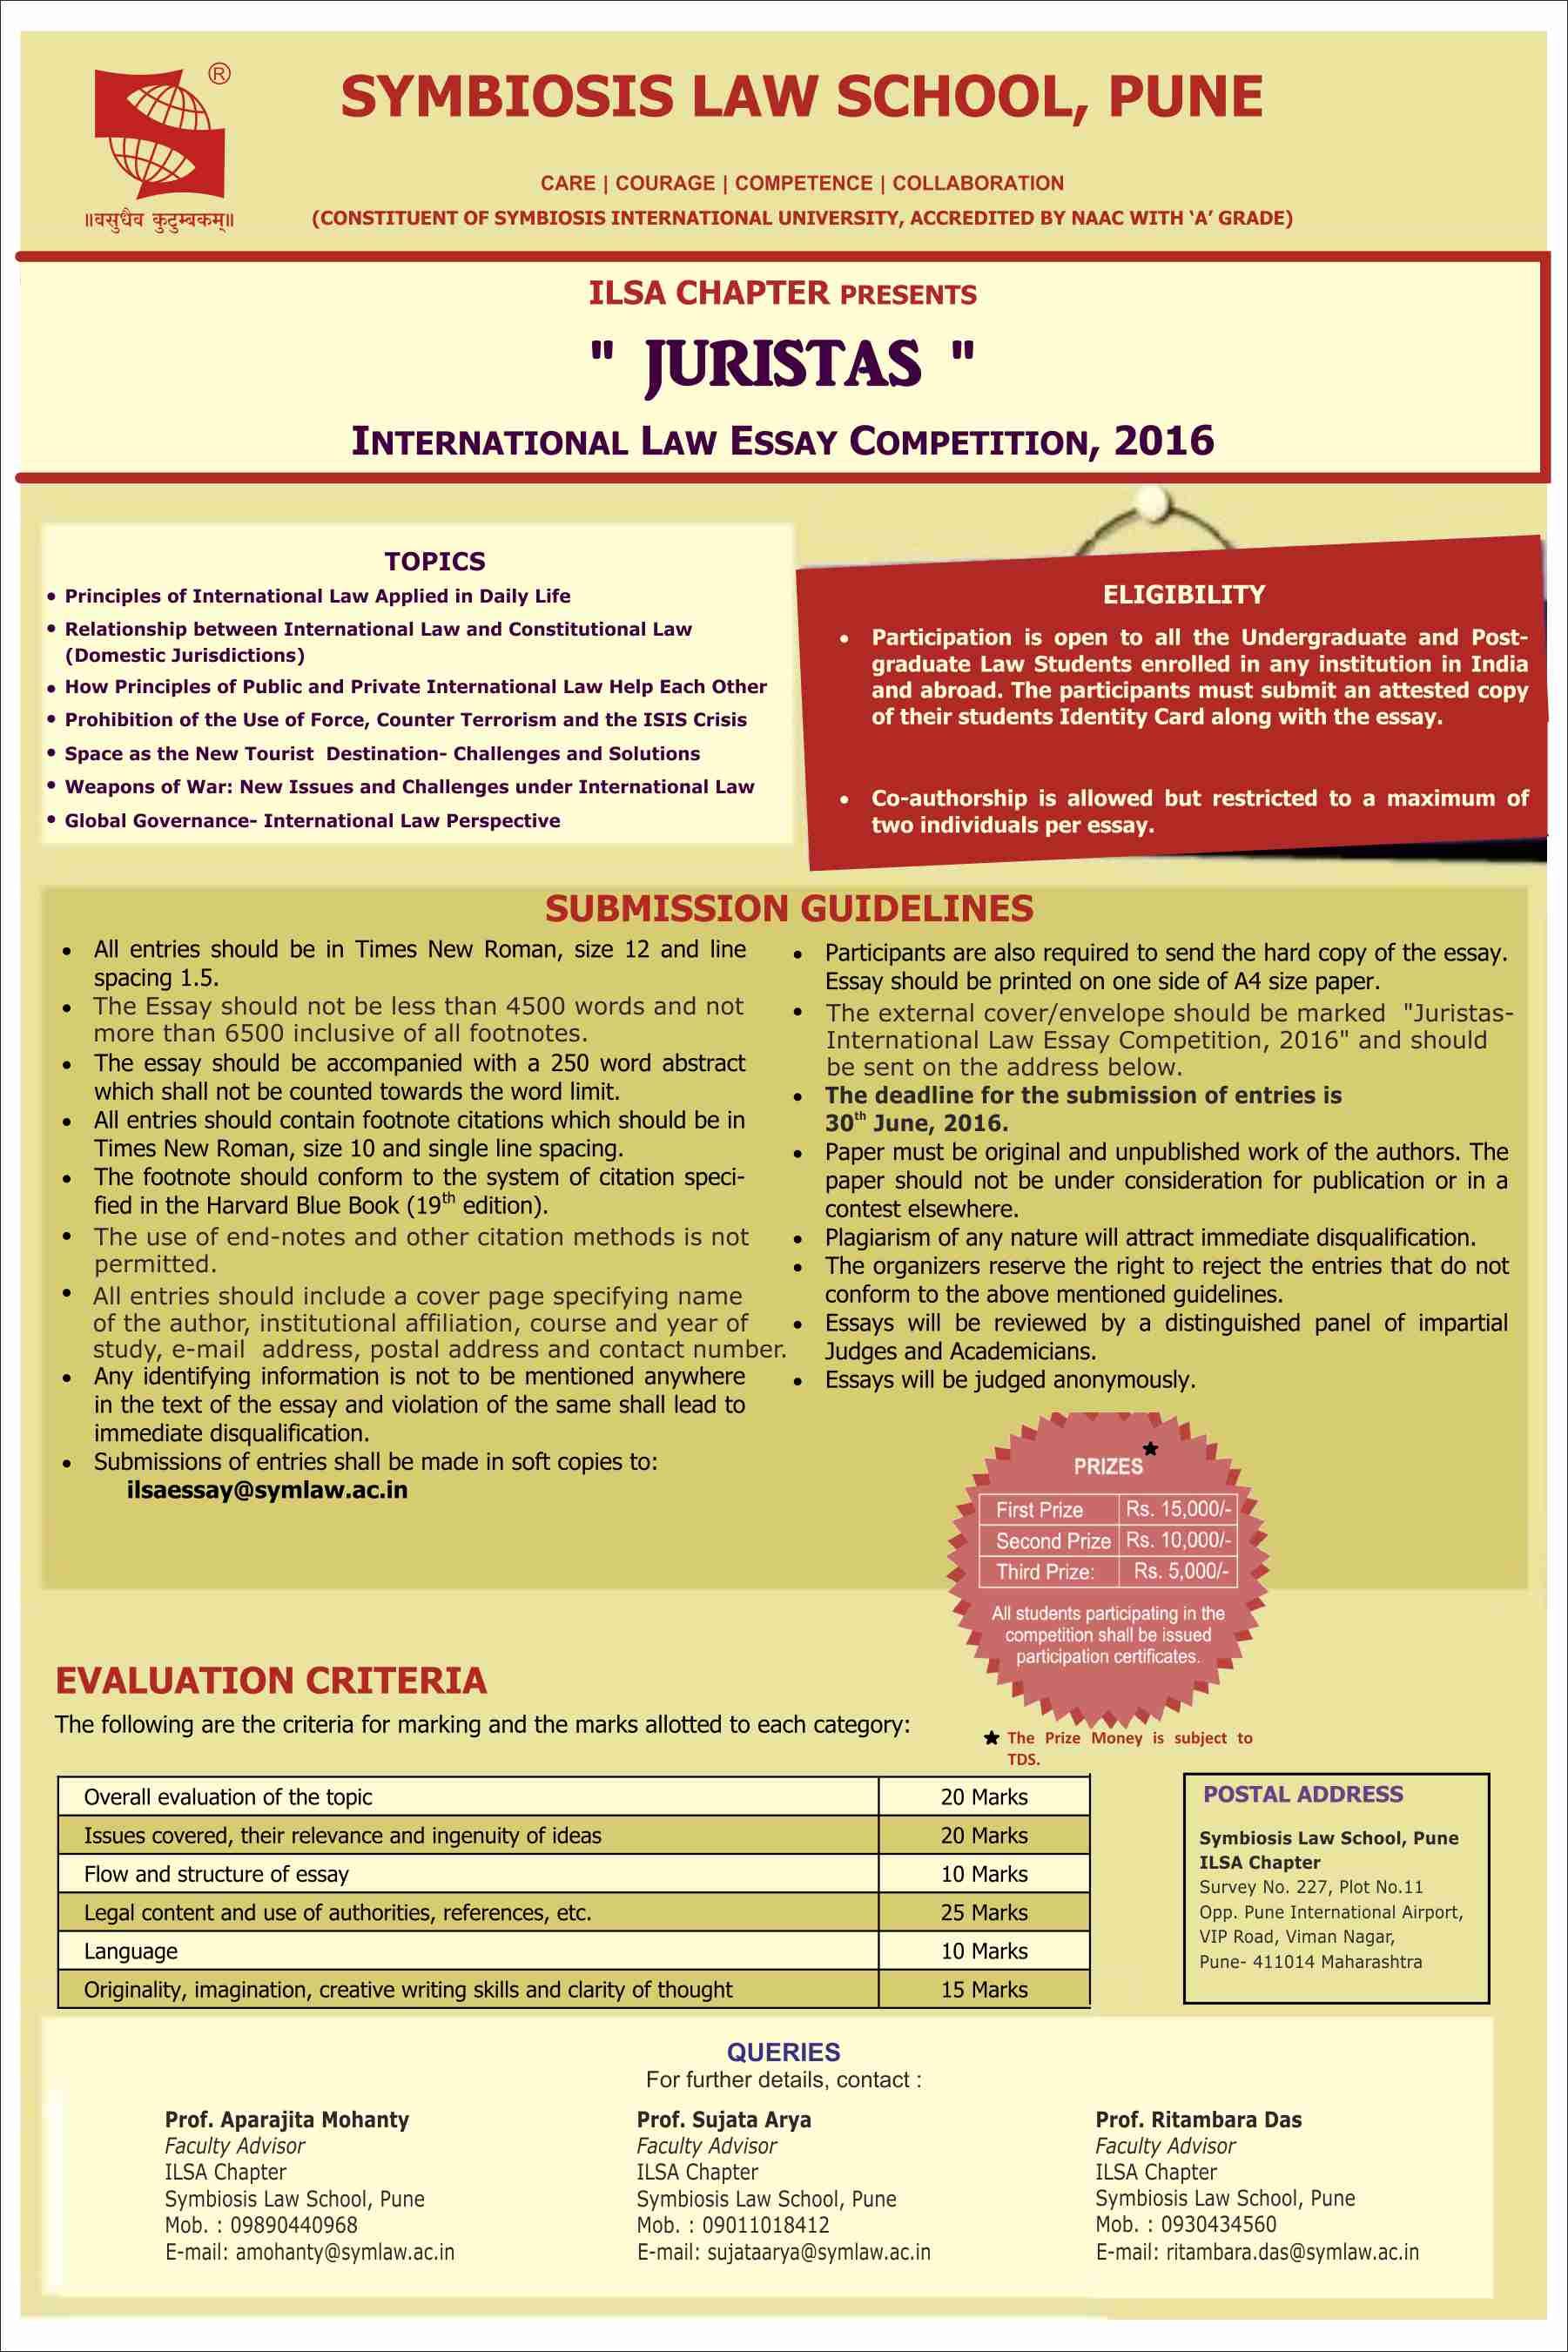 SLS Pune's JURISTAS International Law Essay Competition 2016